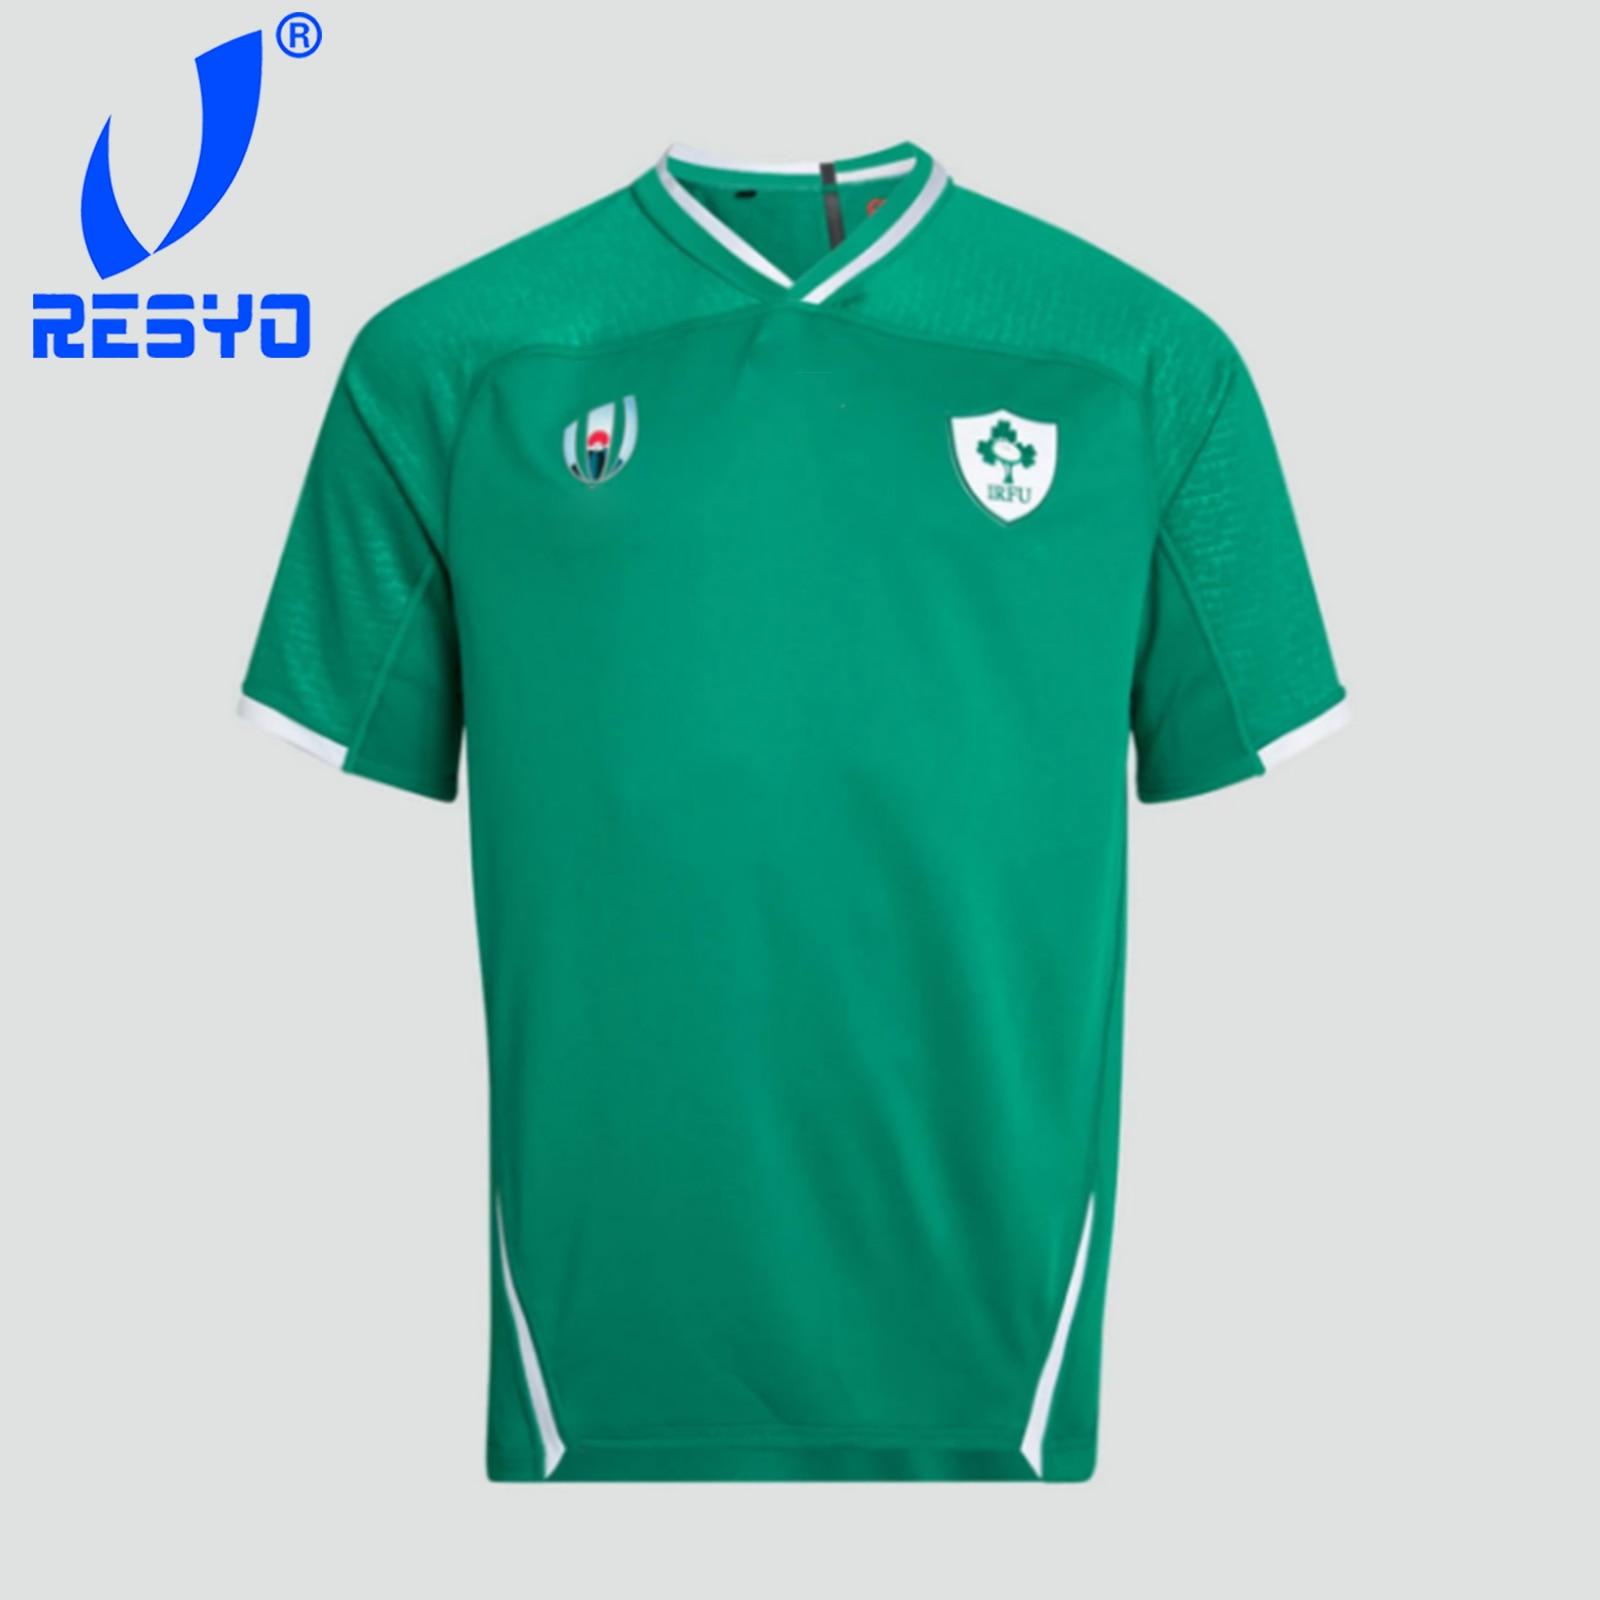 Jersey Rugby Sport-Shirt RESYO For IRELAND Size:S-5xl ALTERNATE VAPODRI PRO